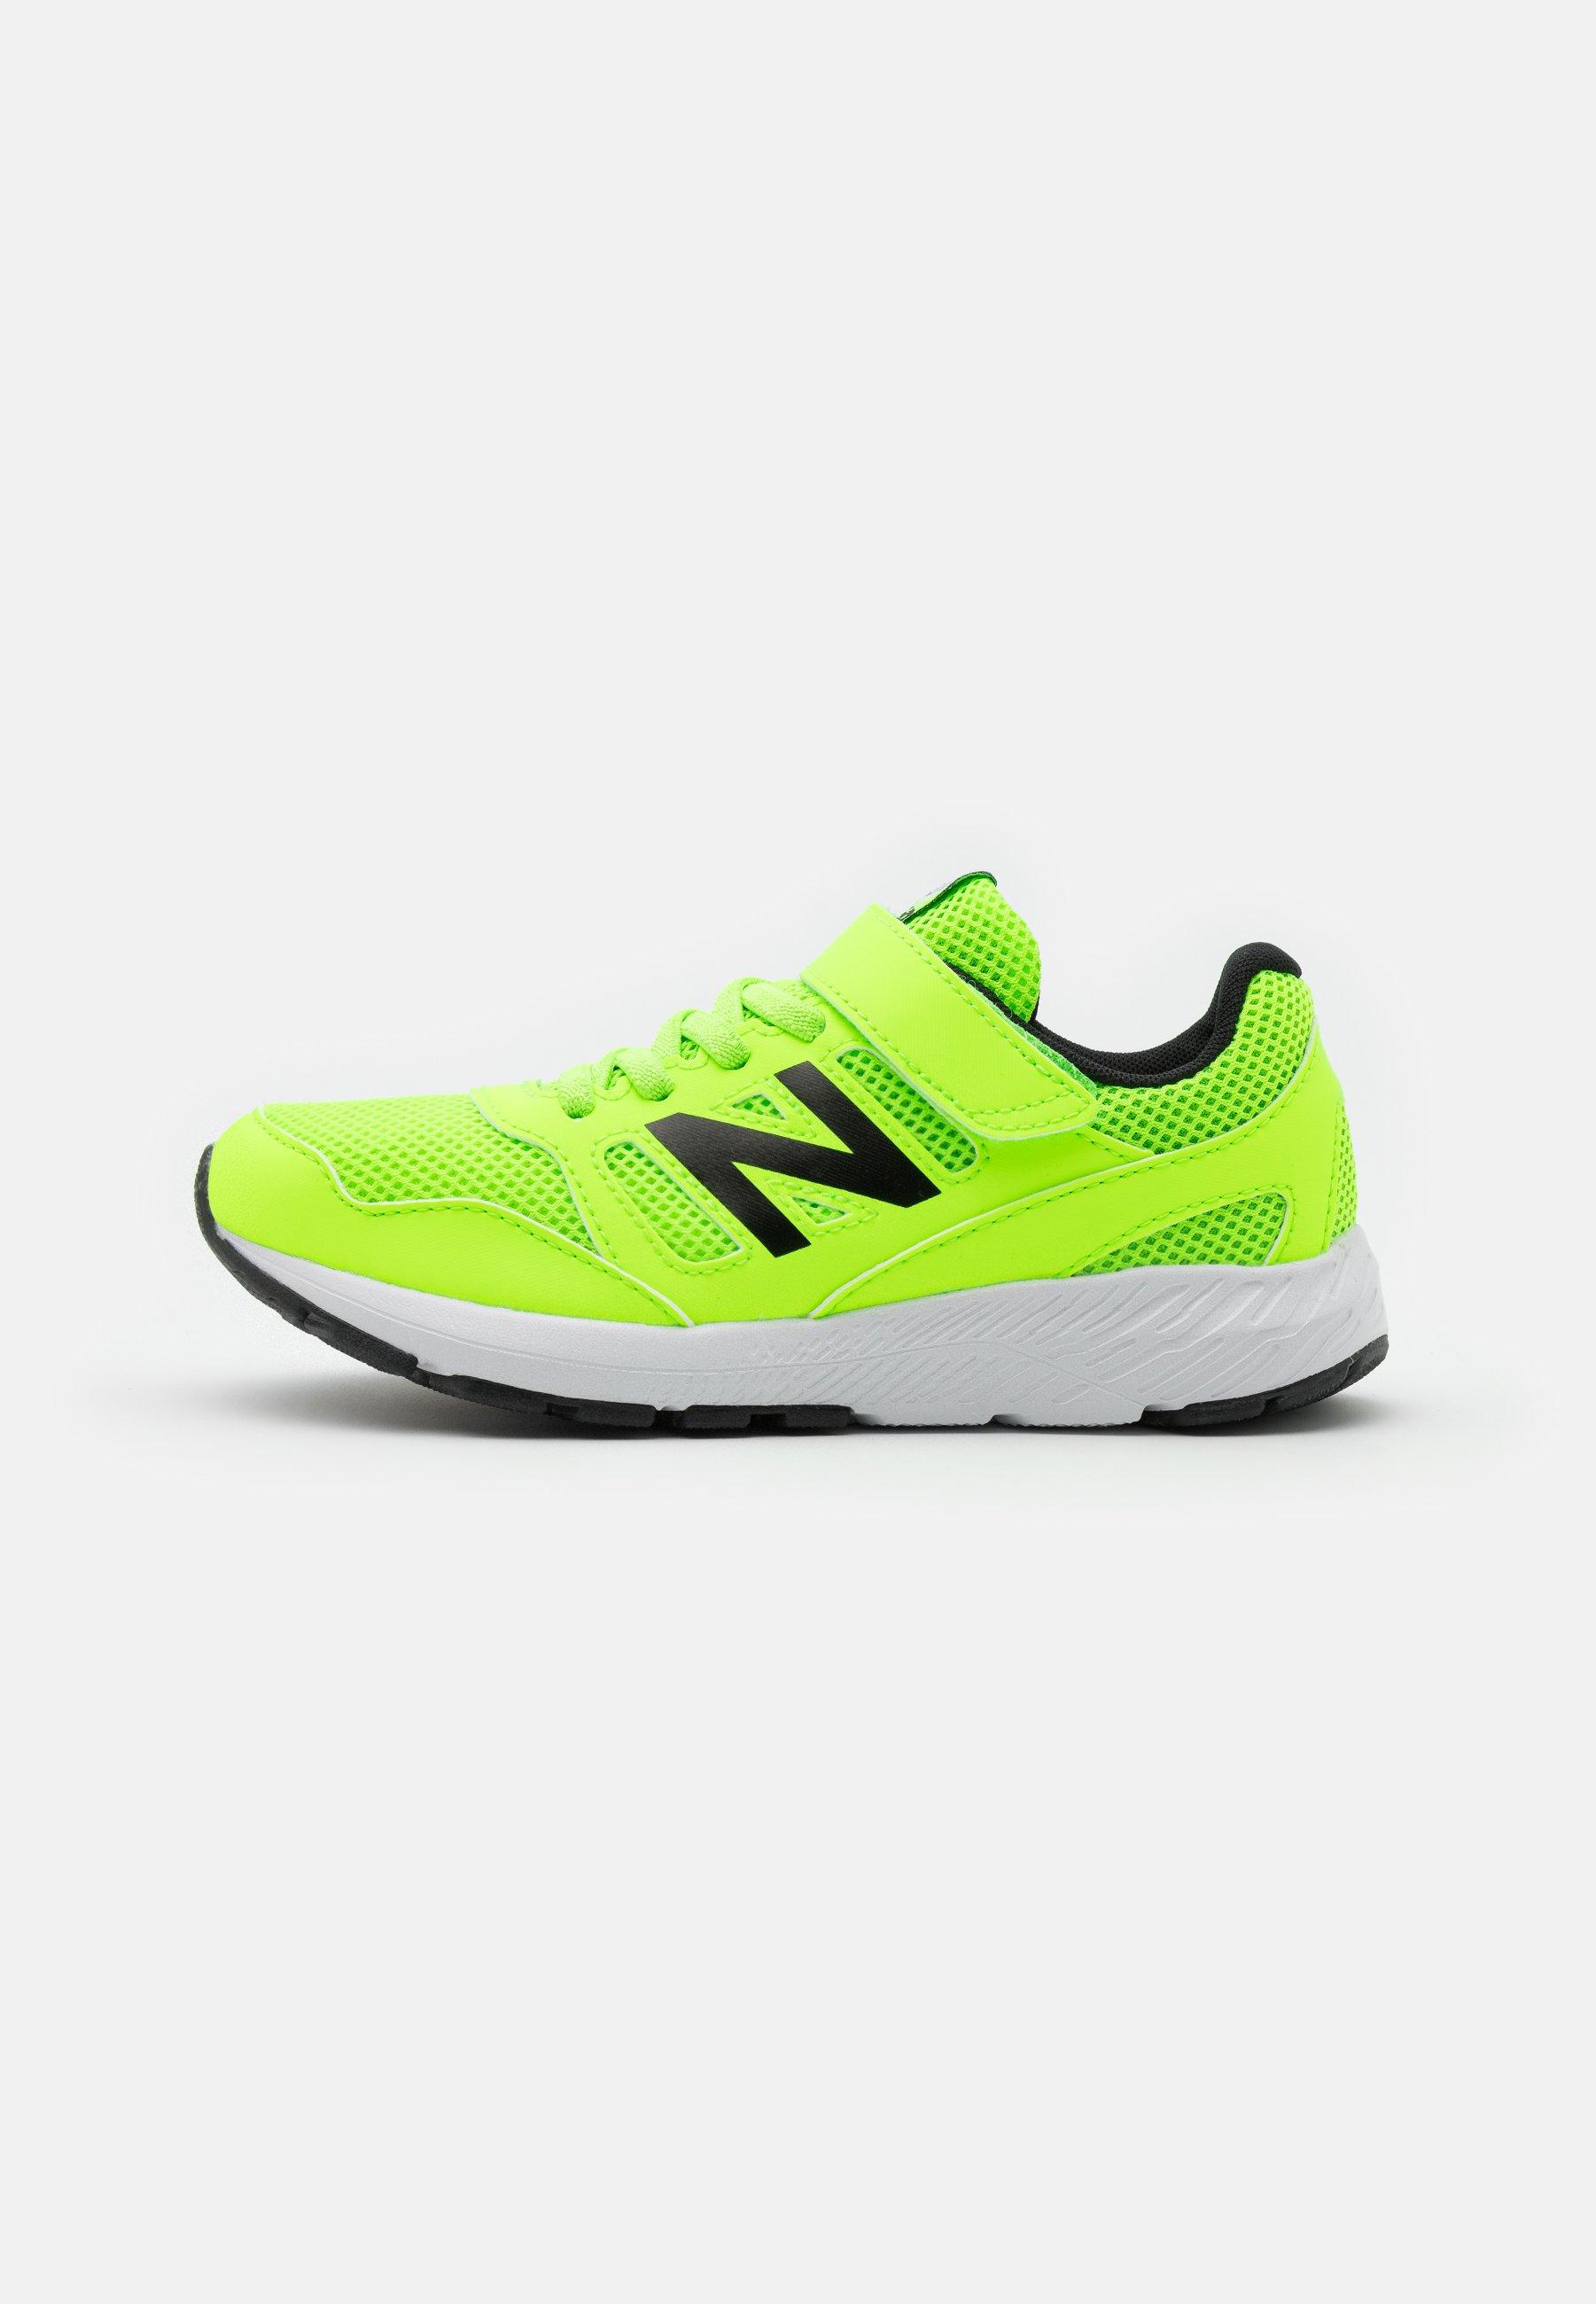 New Balance Scarpe running neutre - lime/giallo fluo - Zalando.it